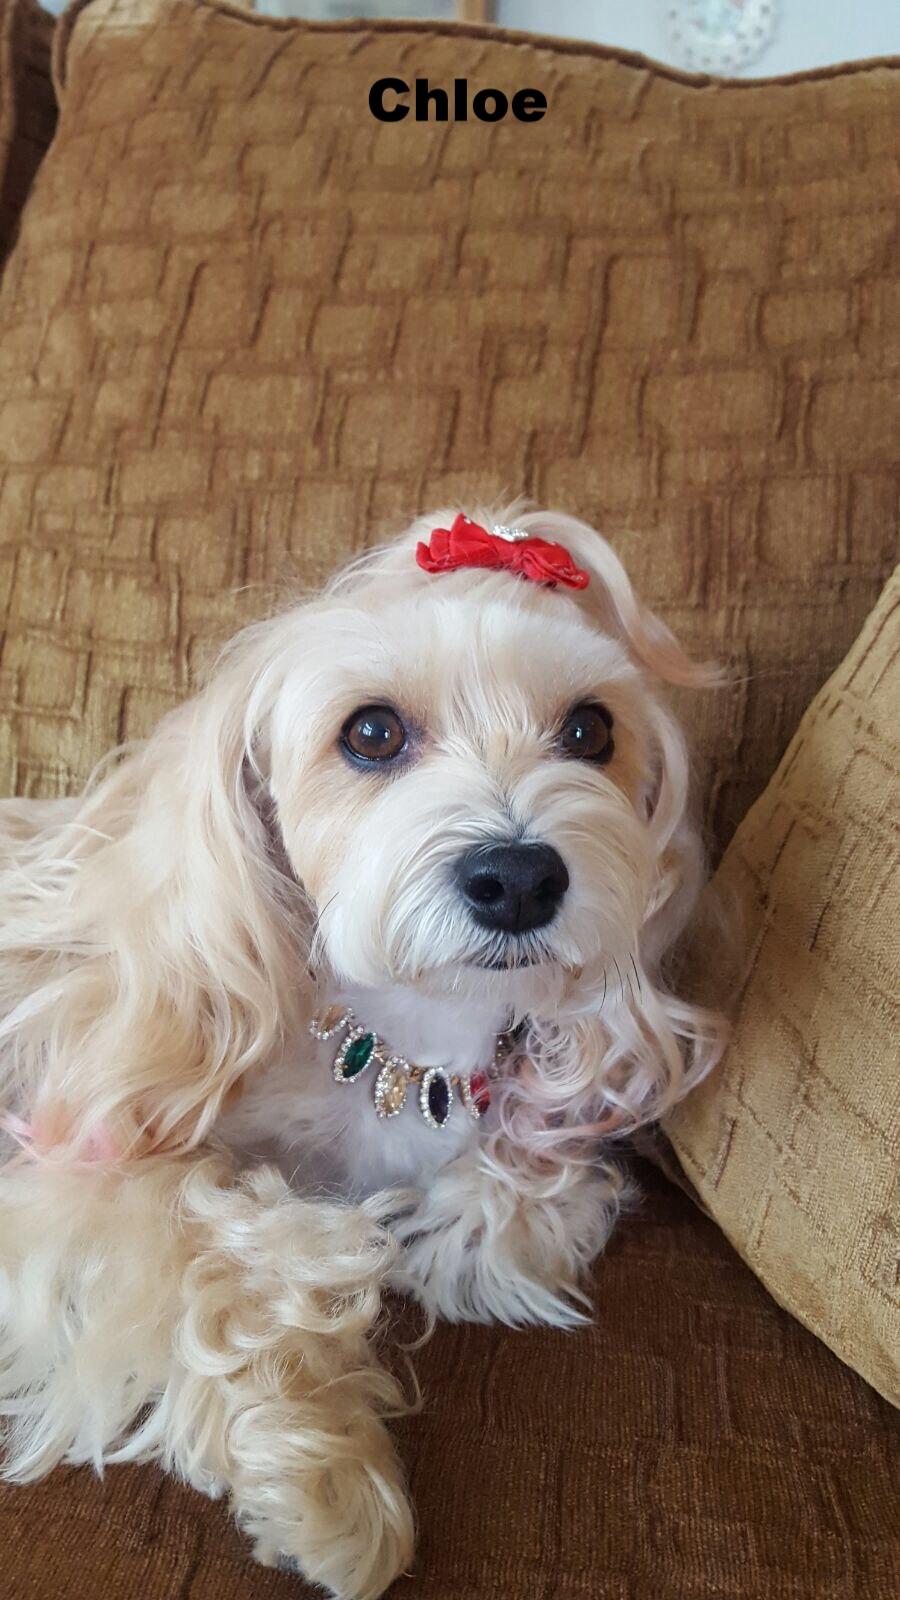 Chloe from California